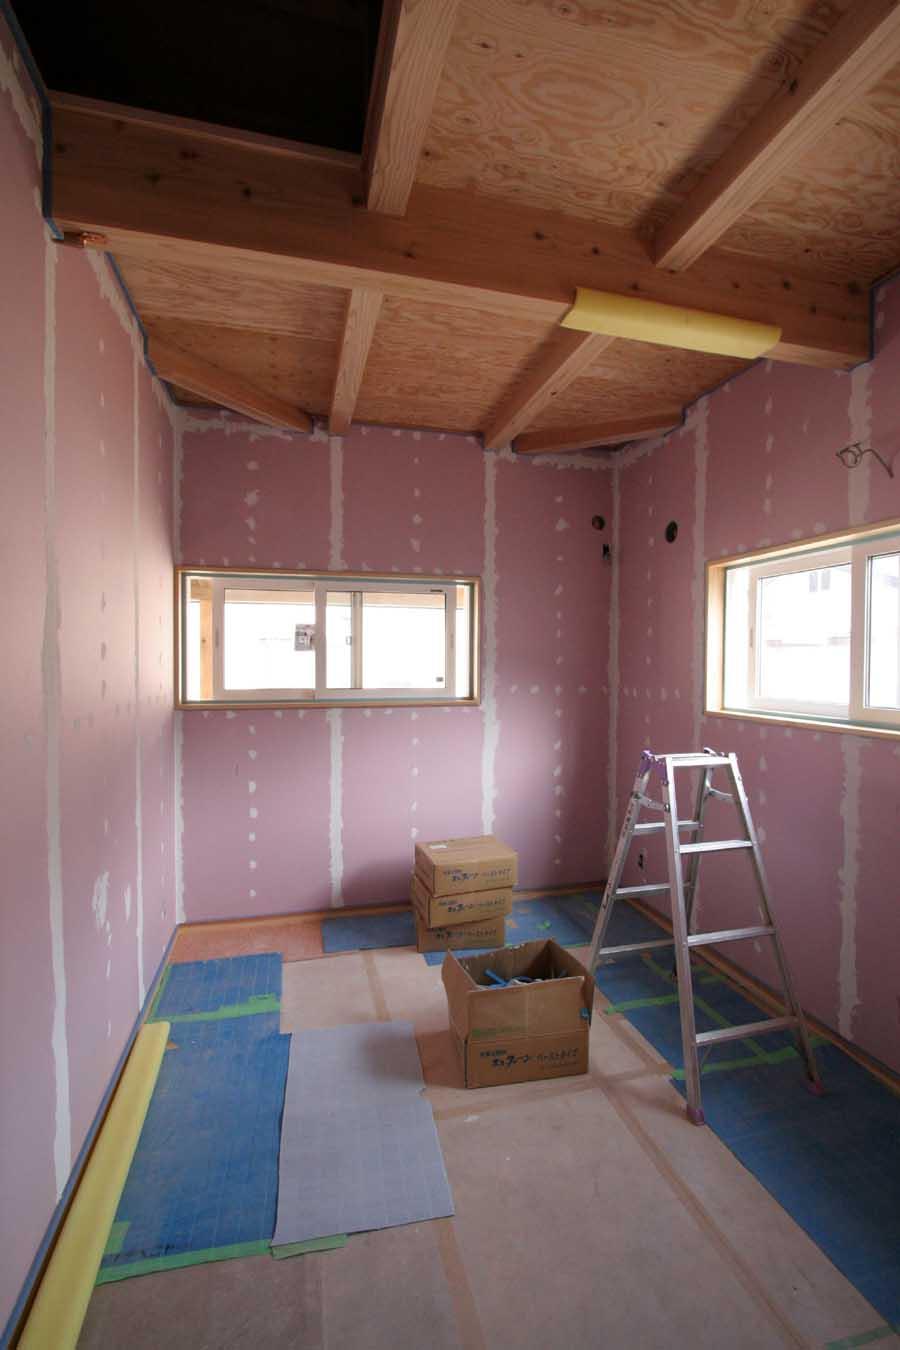 K様邸「中和二丁目の家」 工事中です。_f0150893_20271837.jpg